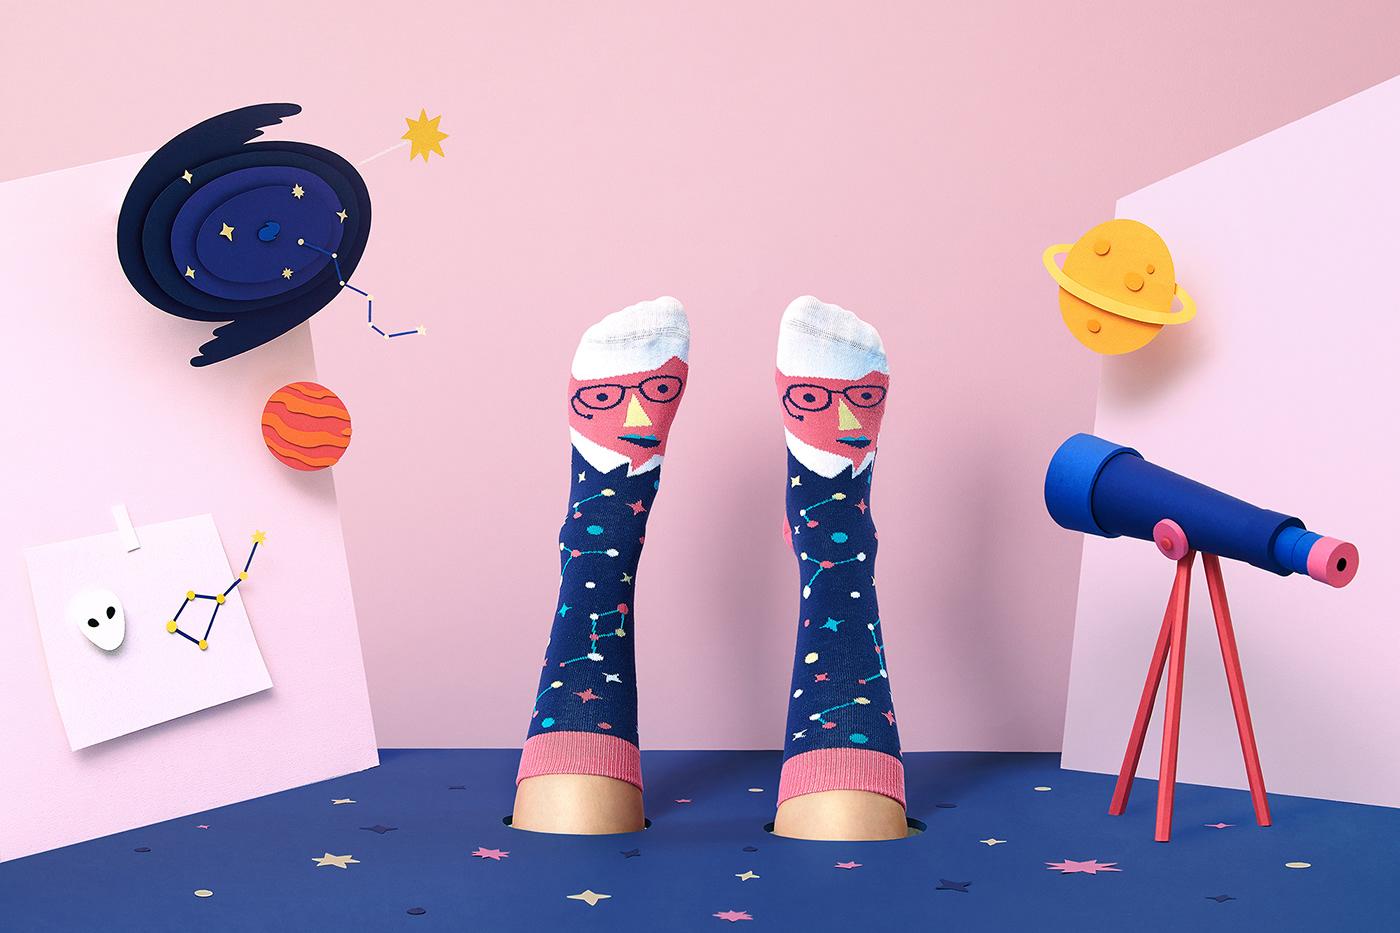 paper fashion photography paper art set design  Art Director paper artist ILLUSTRATION  Handmade Craft paper craft socks